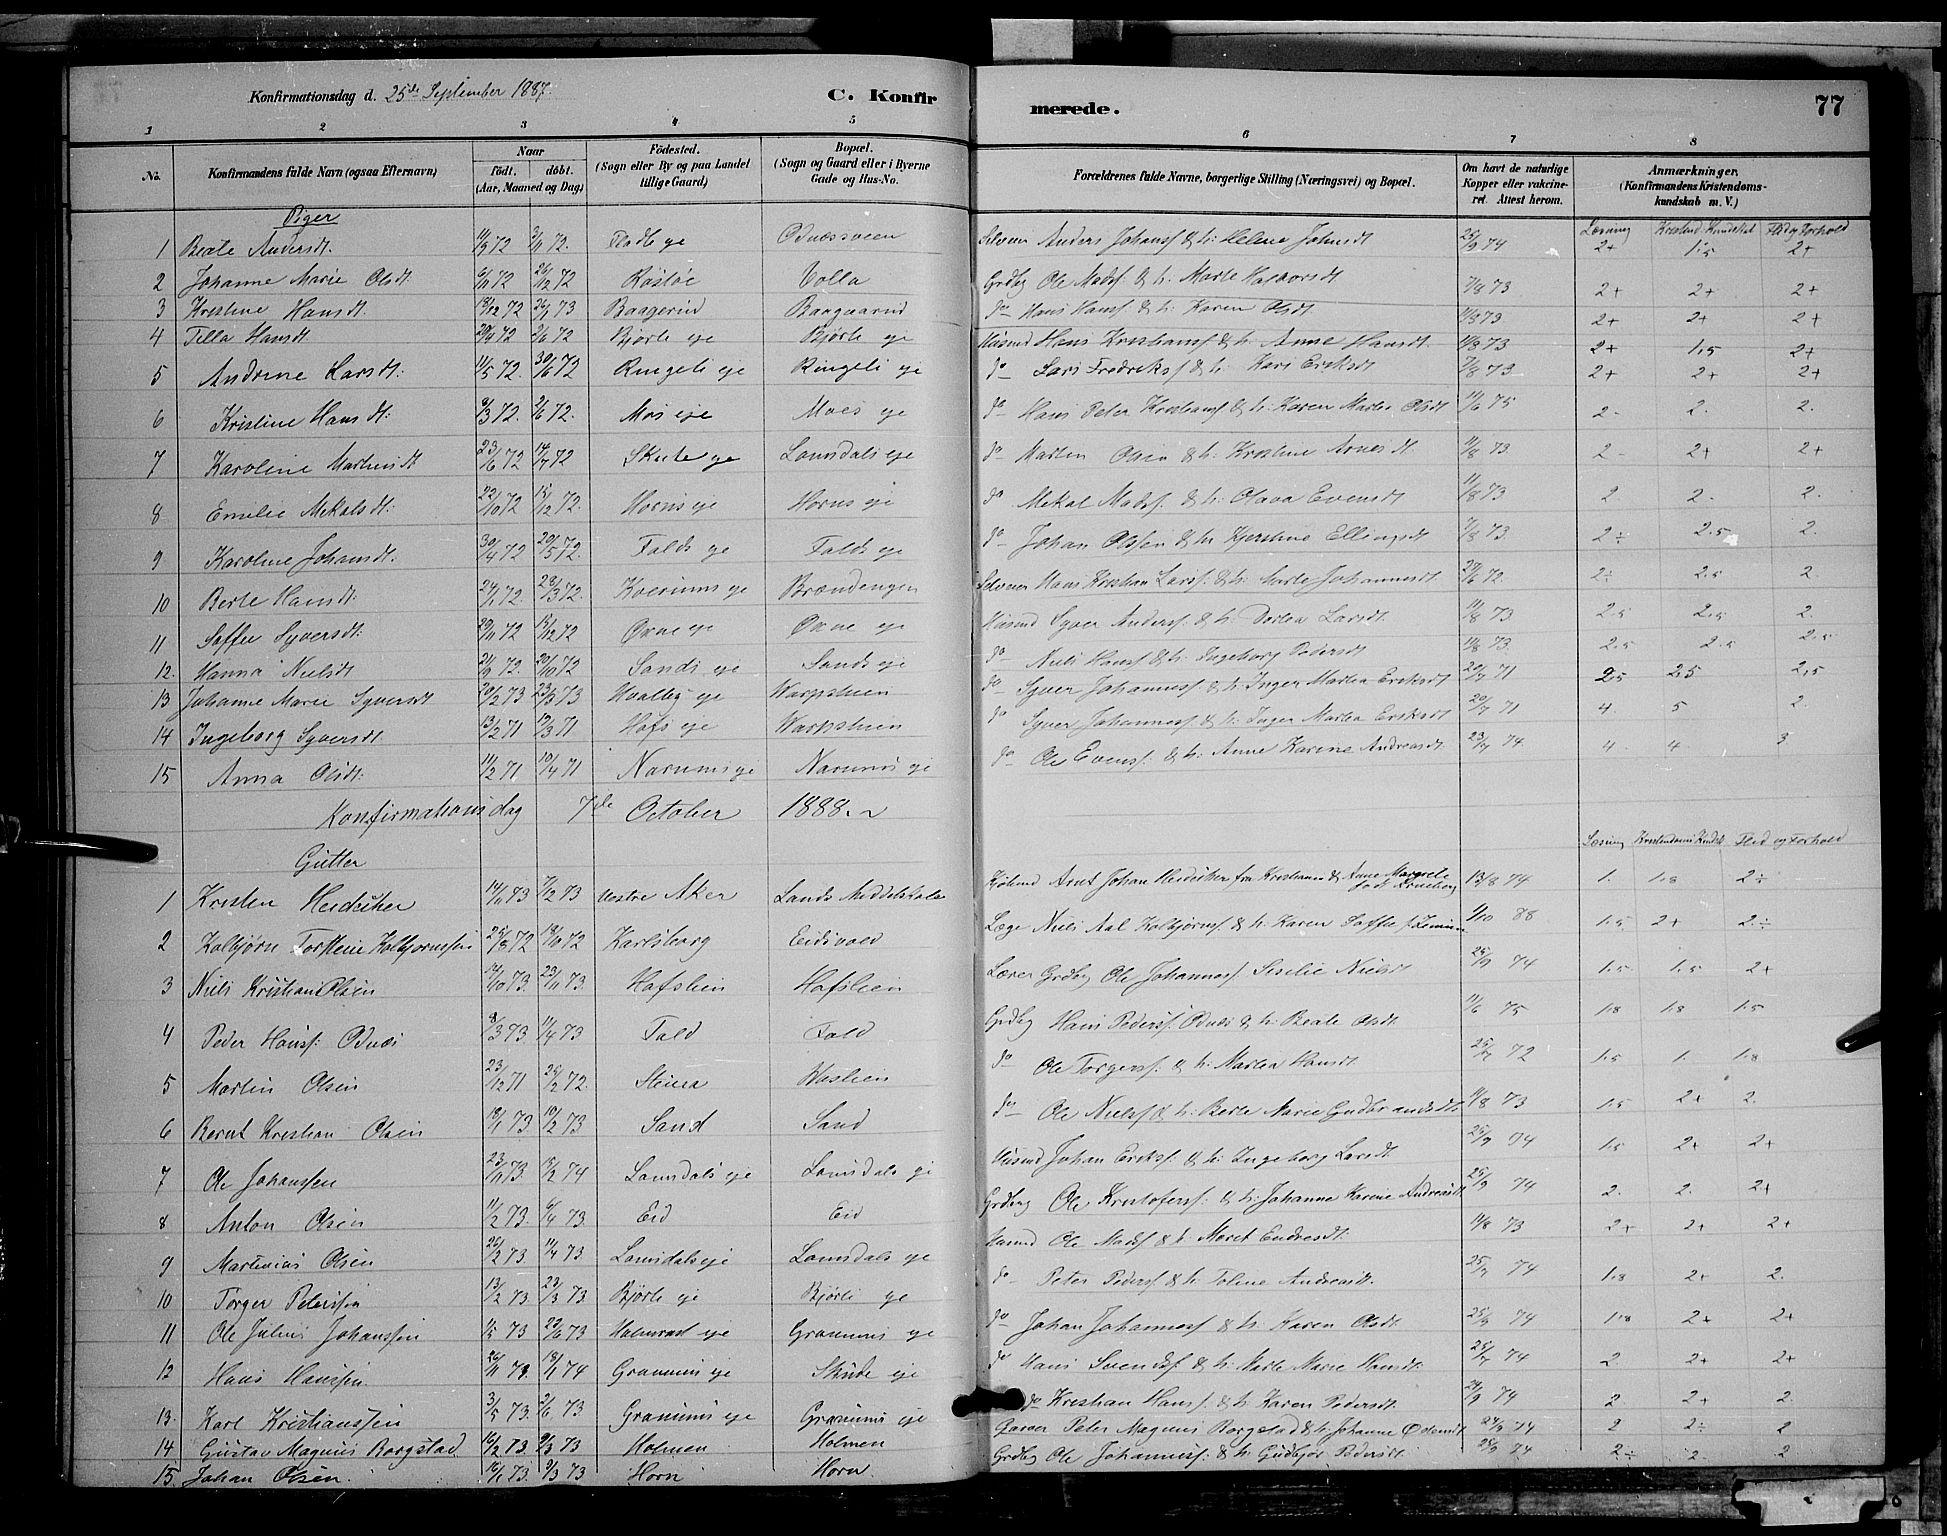 SAH, Søndre Land prestekontor, L/L0002: Klokkerbok nr. 2, 1884-1900, s. 77